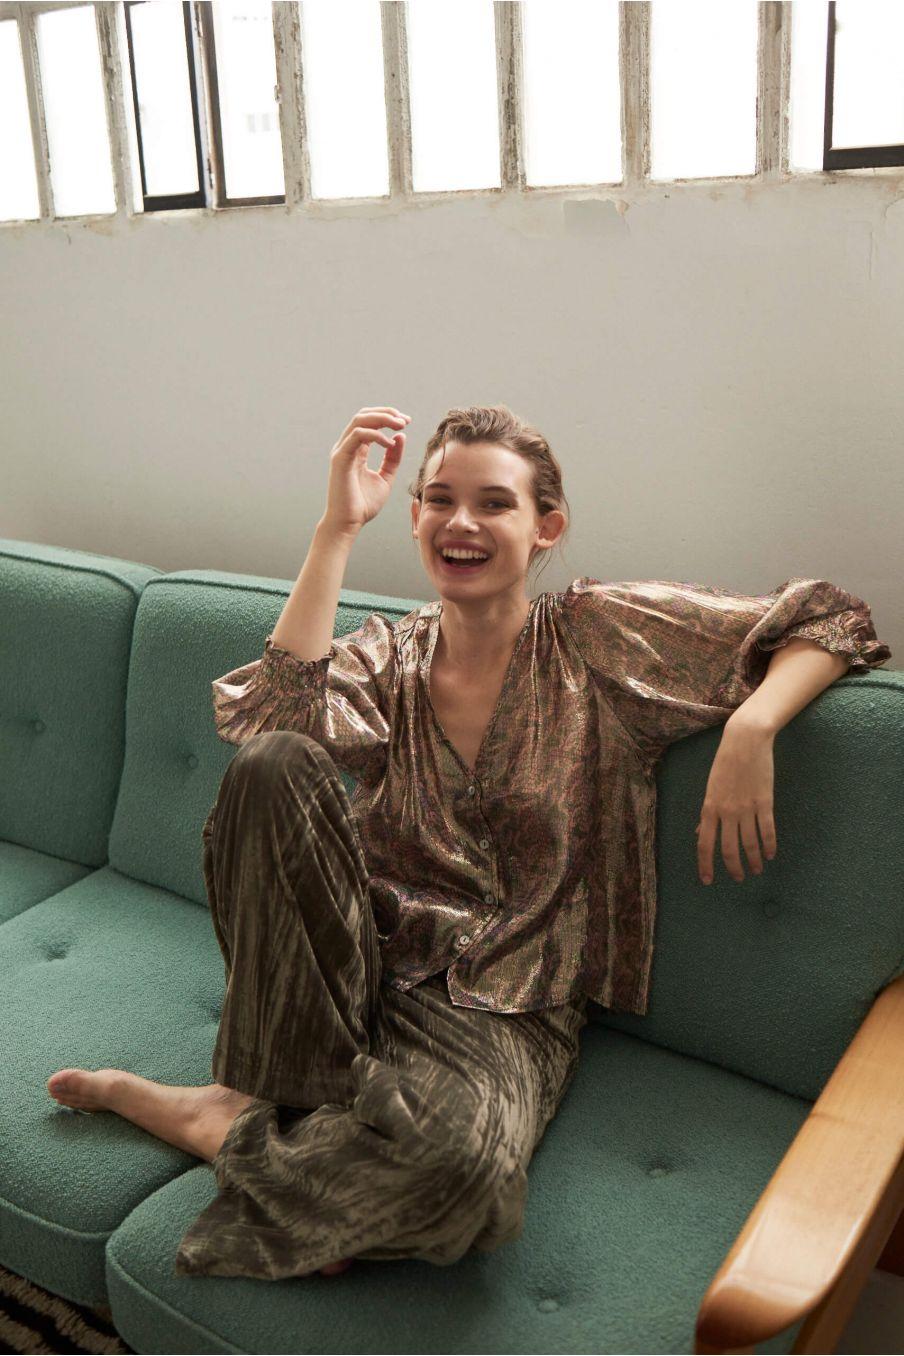 boheme chic vintage blouse femme laurie green polka dots